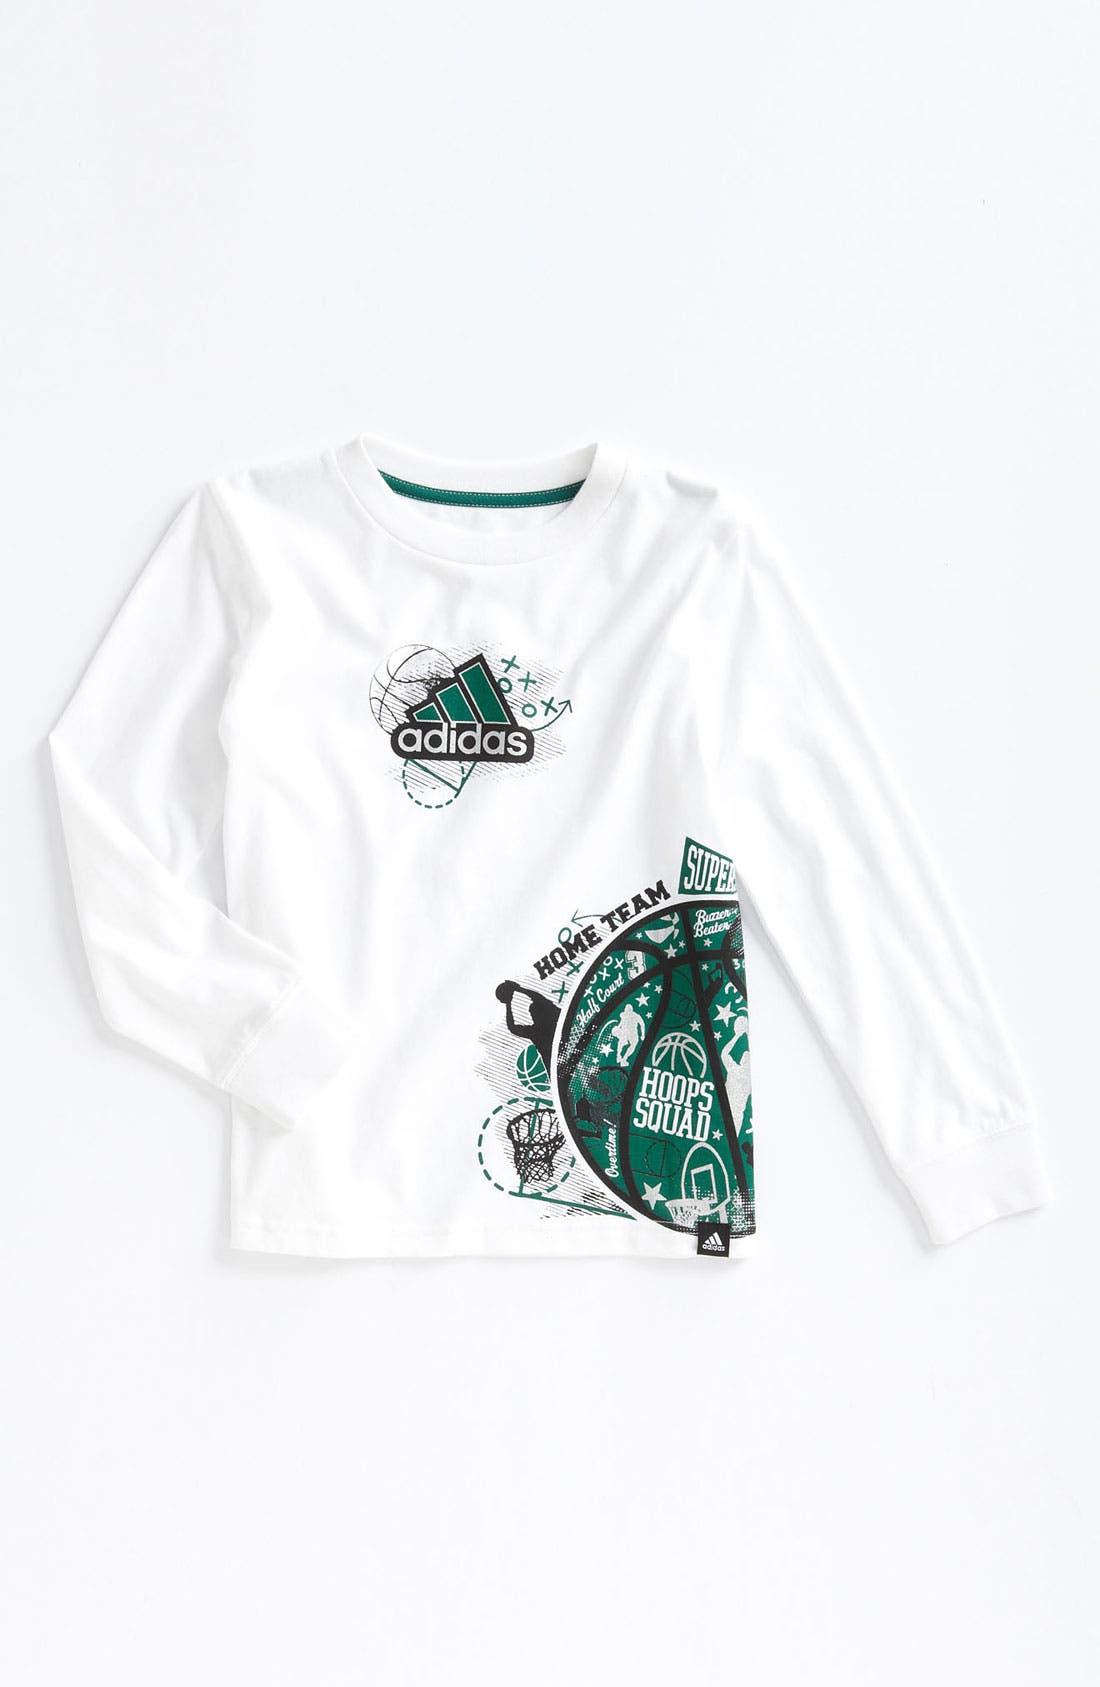 Main Image - adidas 'Playbook' T-Shirt (Little Boys)